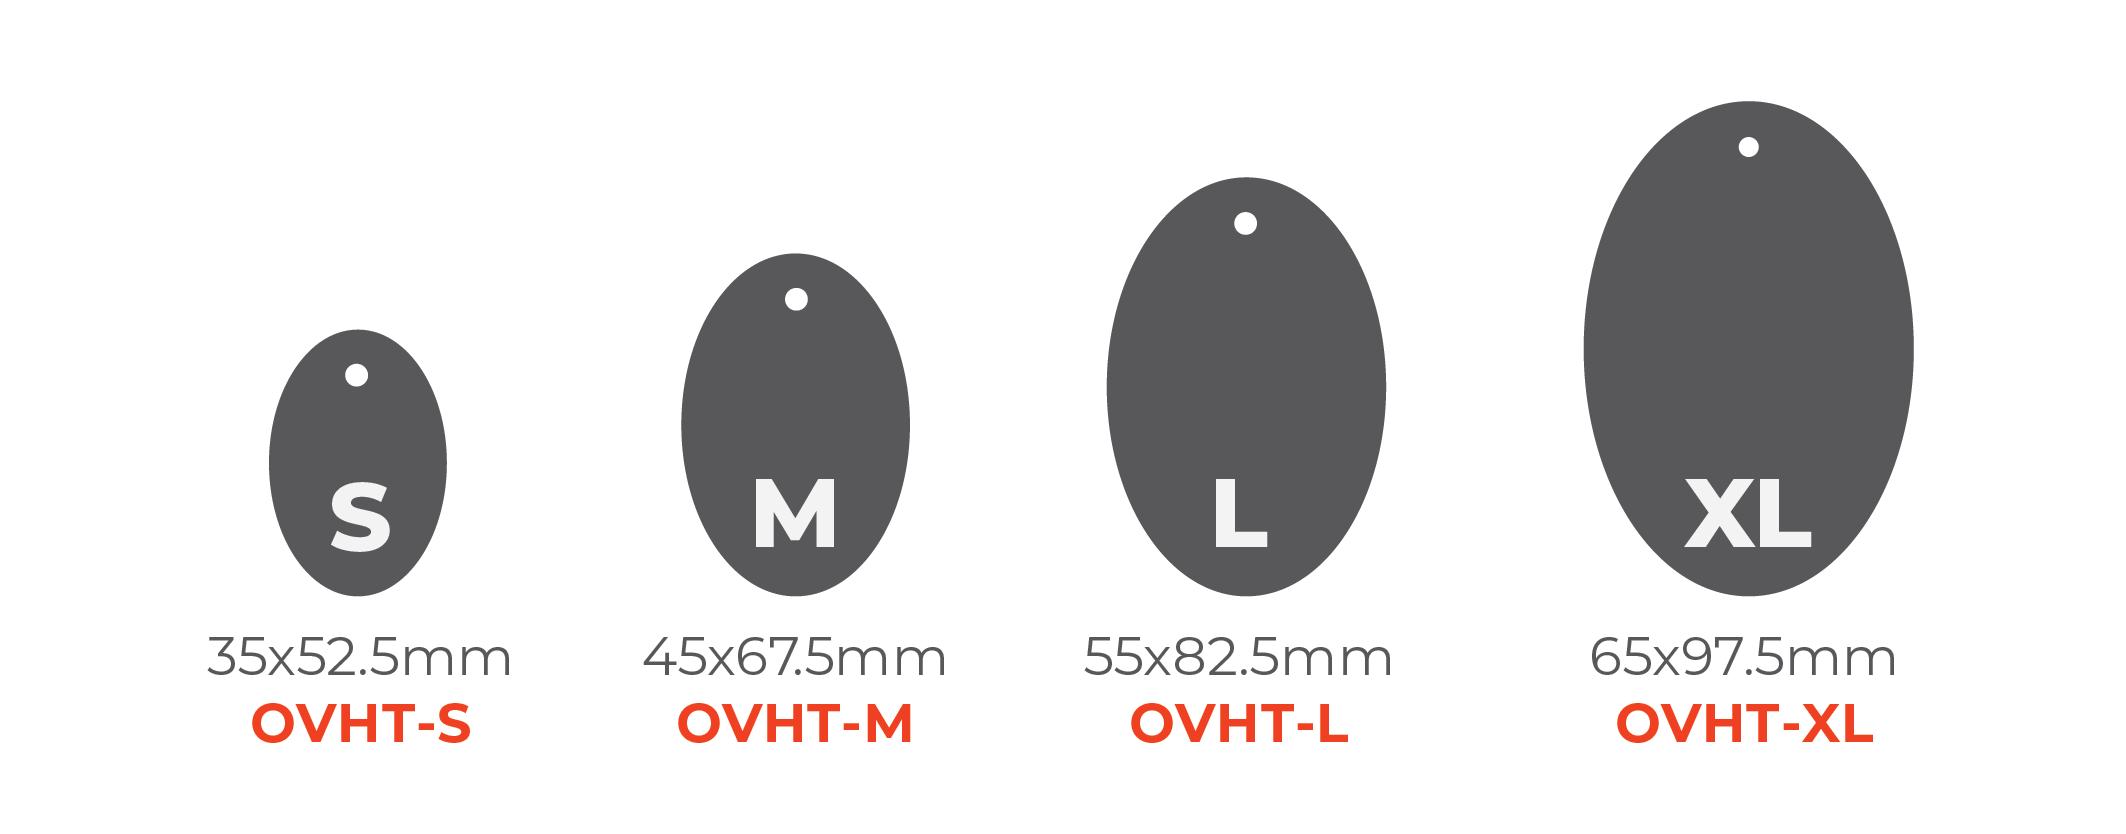 Standard Hang Tags - Oval Tags 0x0mm 01 Image